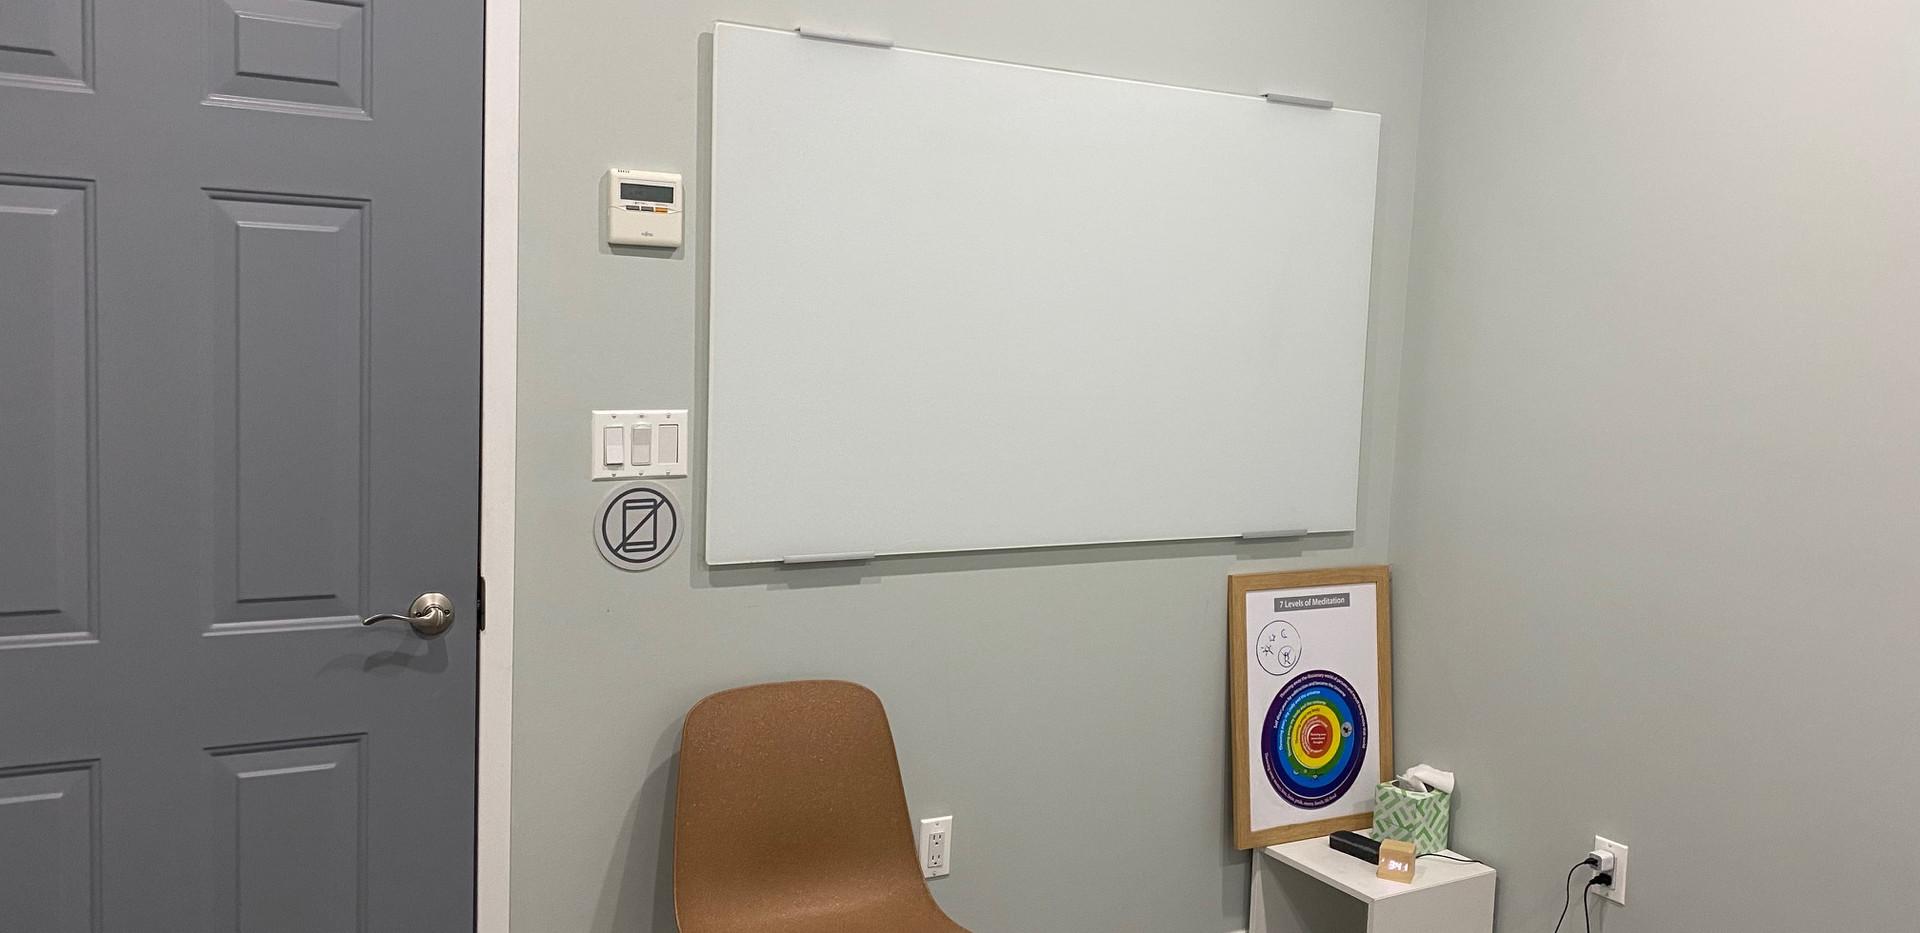 Wisdom Room Chair